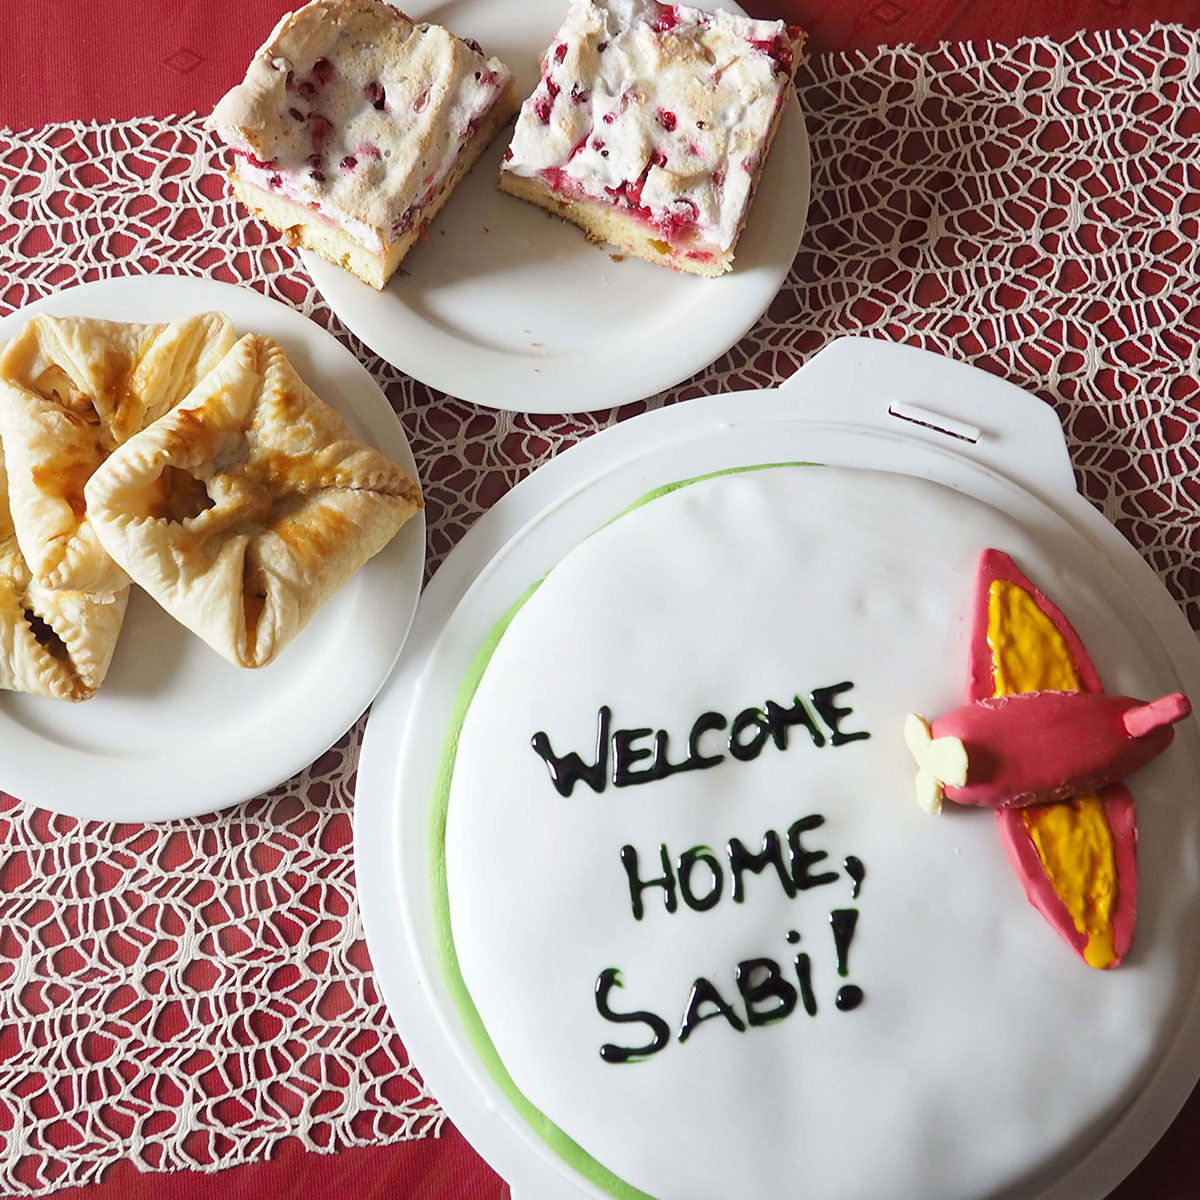 welcome-home-sabi-torte